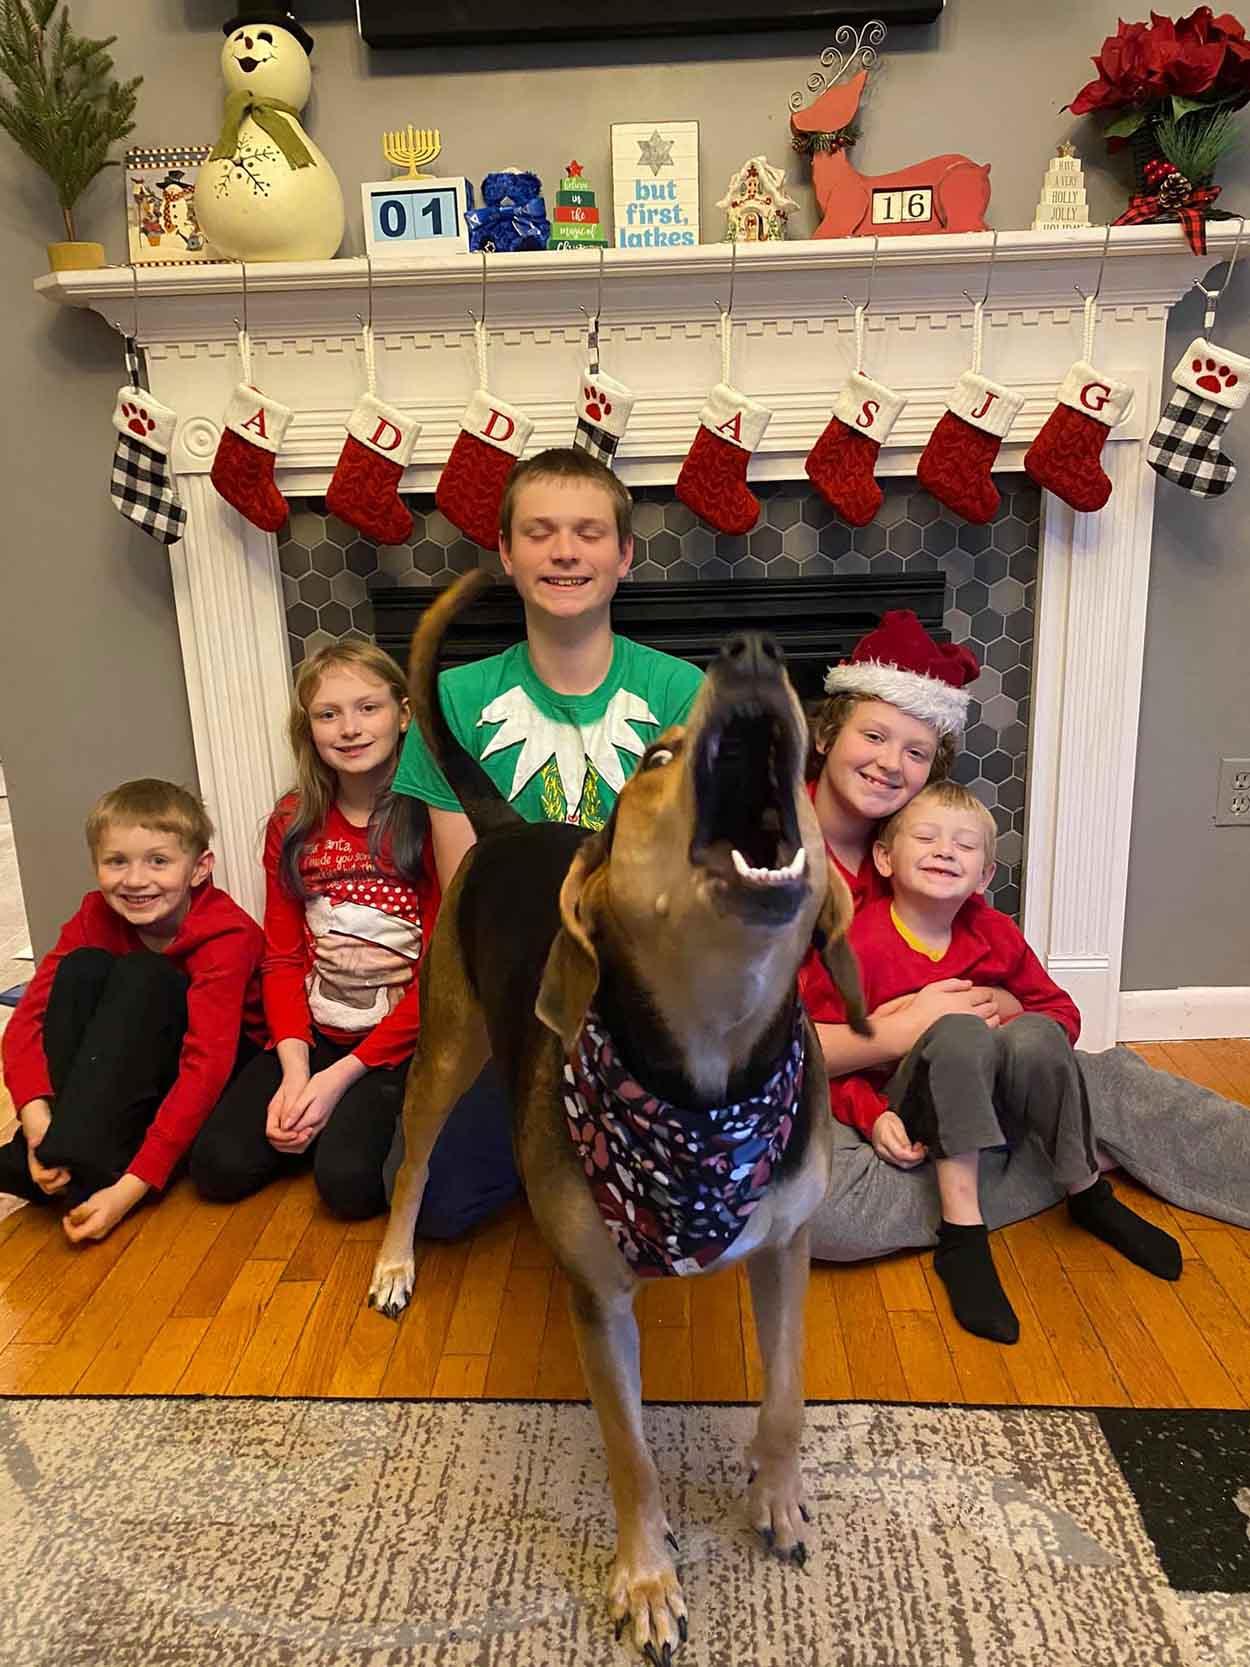 Perro salta cada que mamá toma una foto para la tarjeta de Navidad